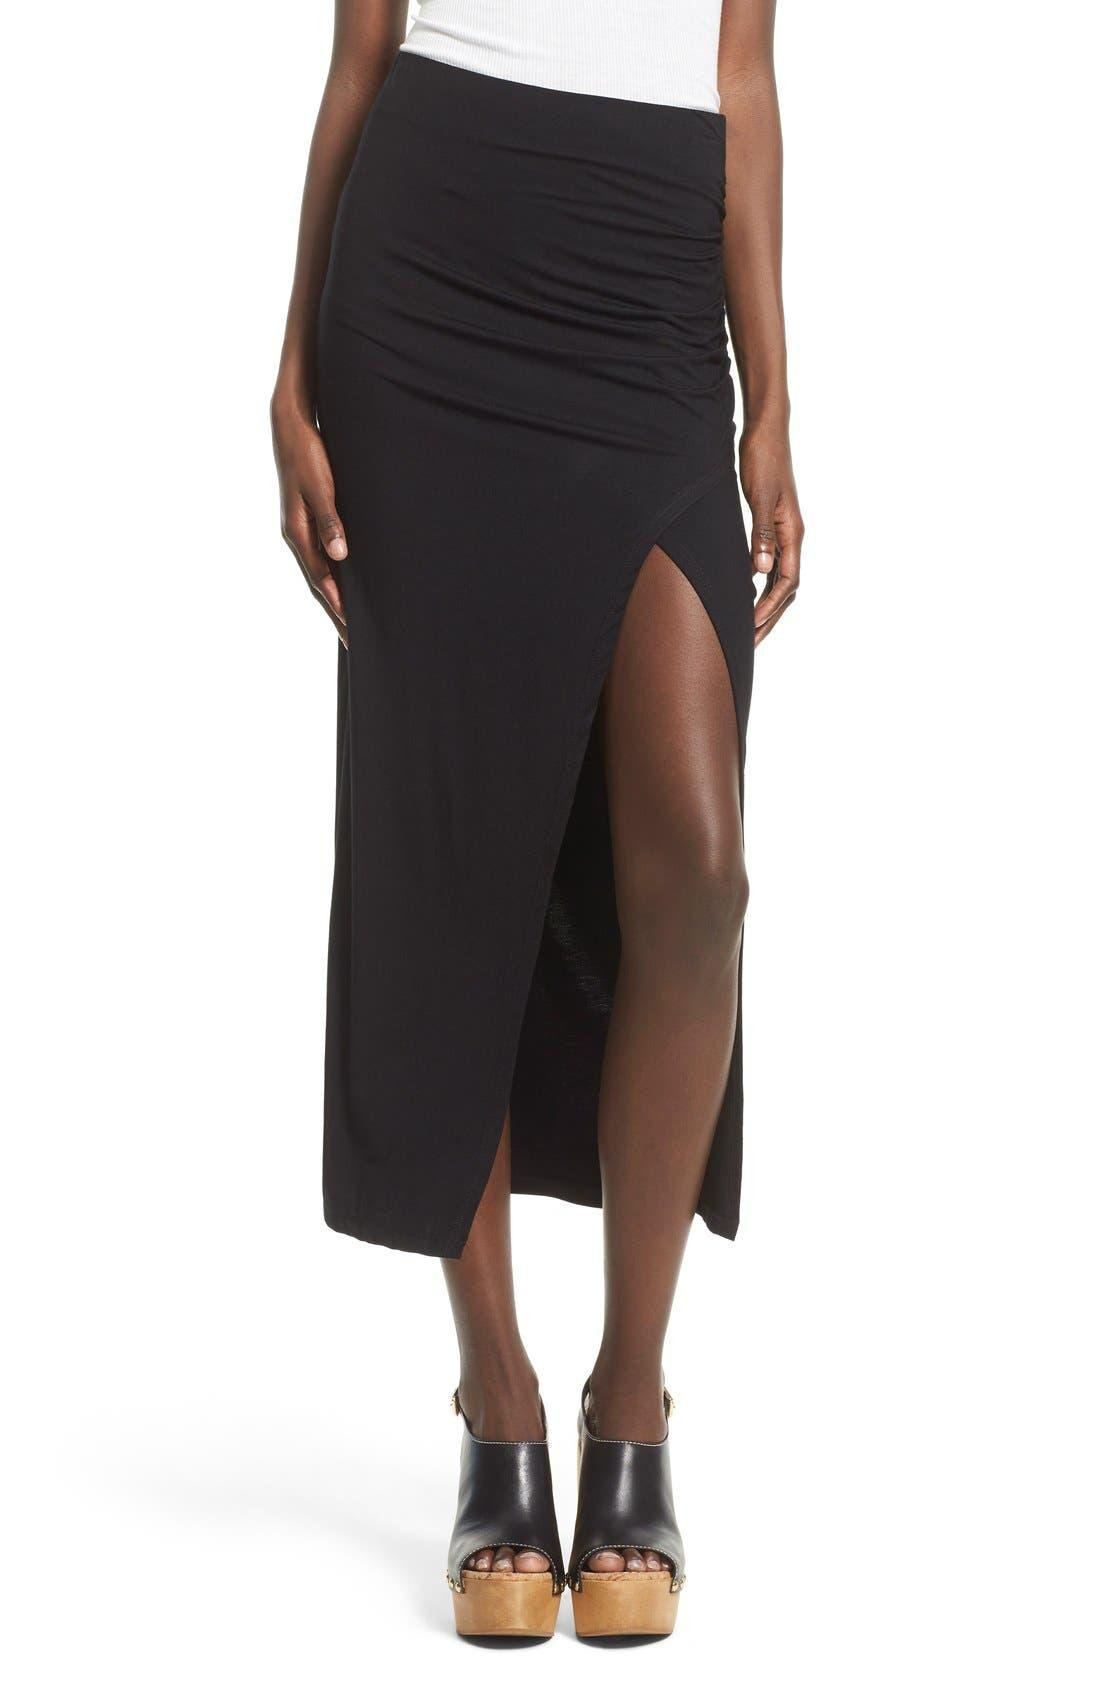 ASTR THE LABEL ASTR High Slit Maxi Skirt, Main, color, 001